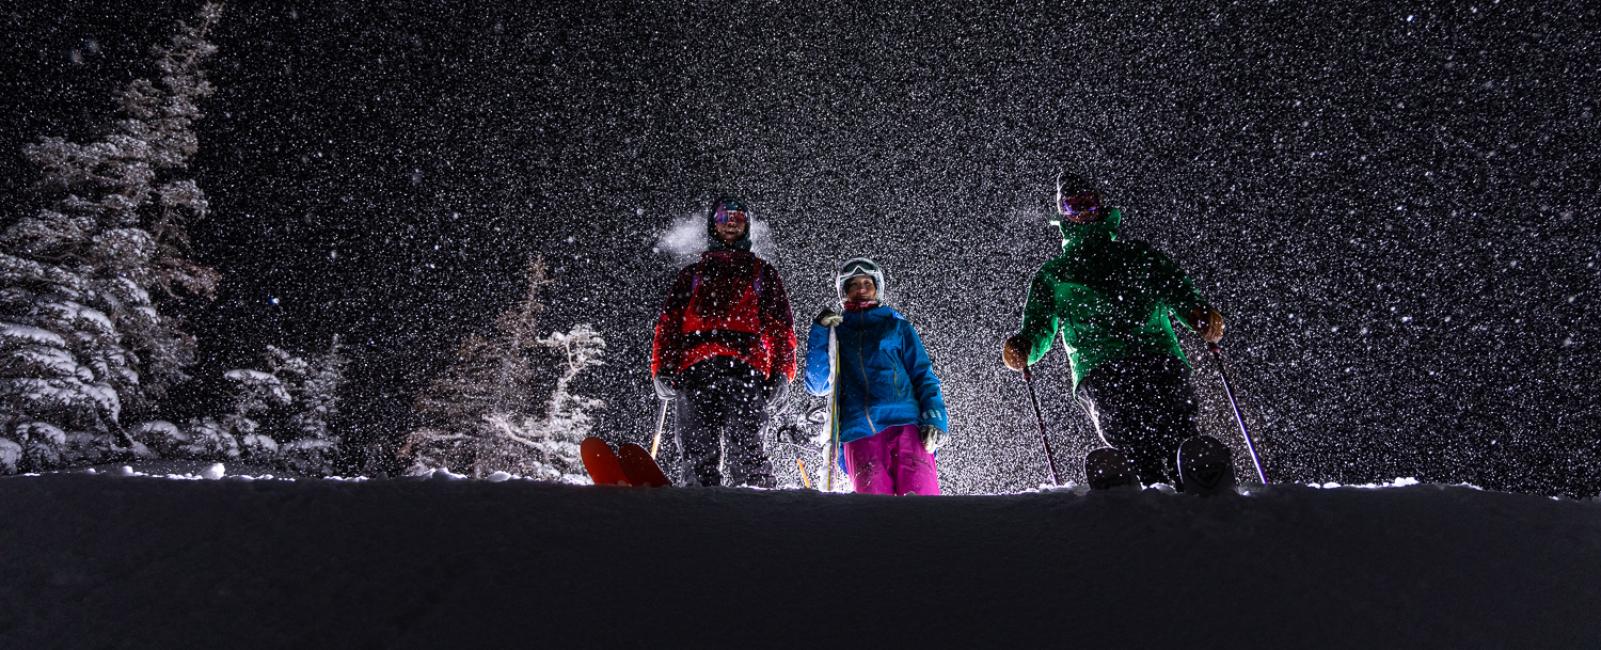 2020/21 Utah Ski Resort Opening Dates